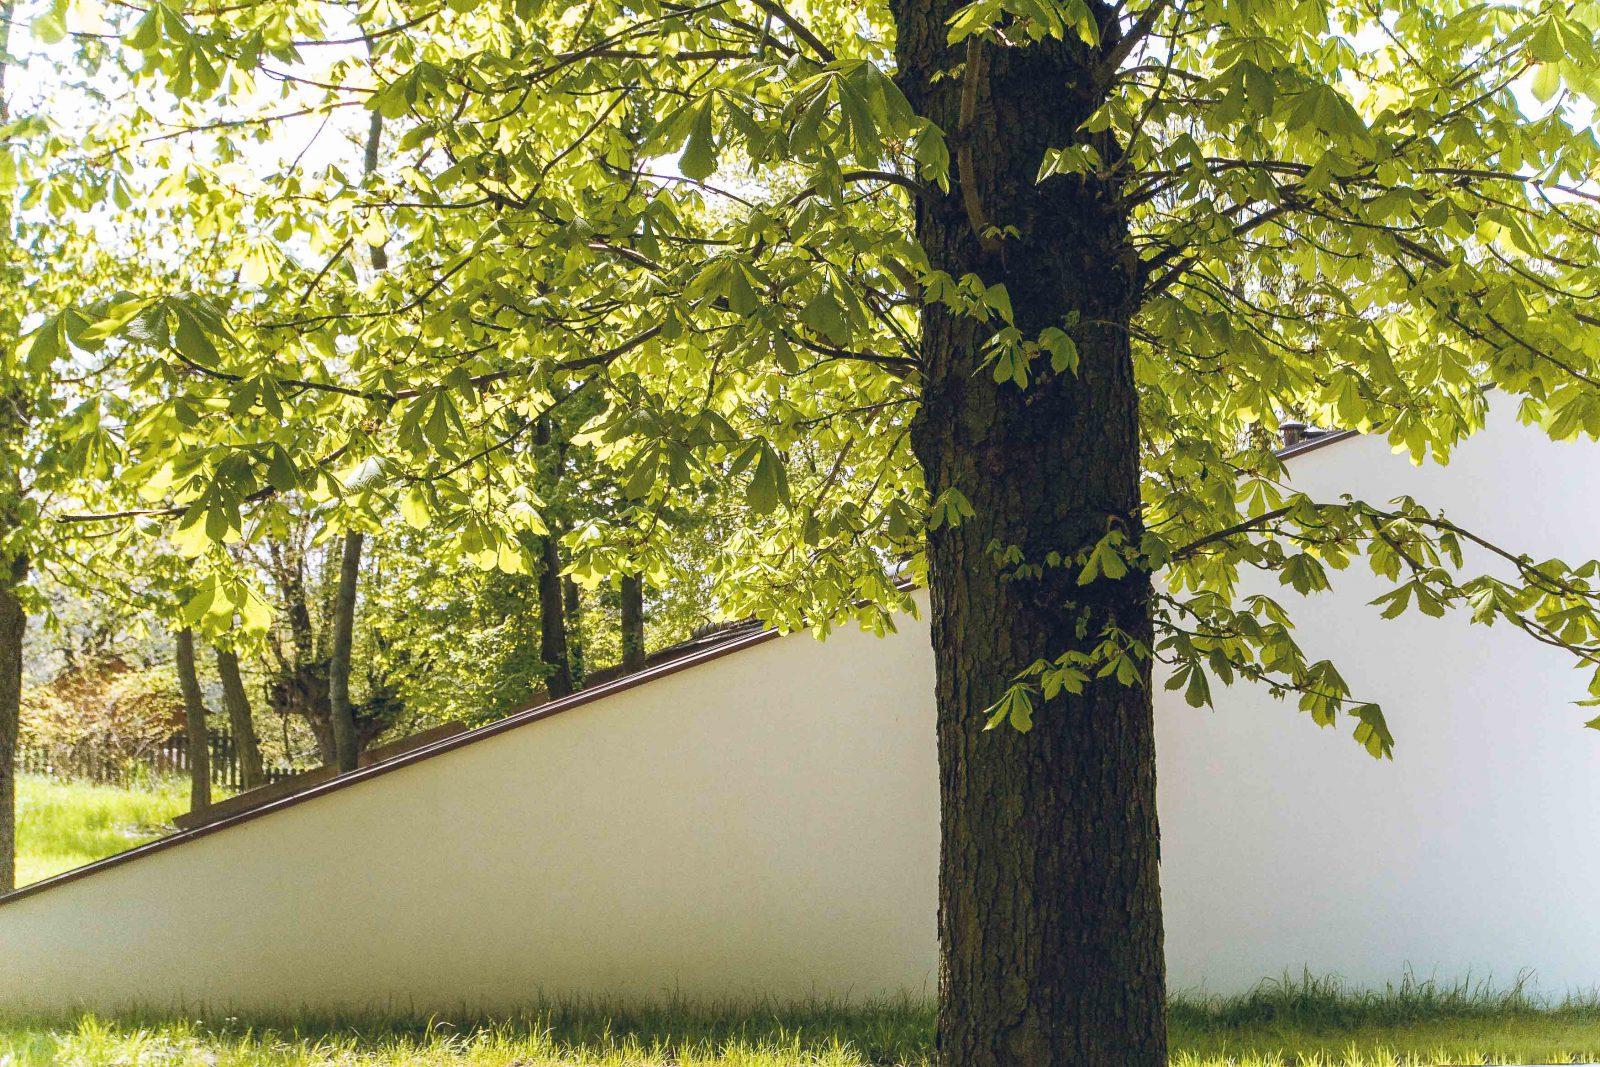 Baum gruen Gebaeude detail